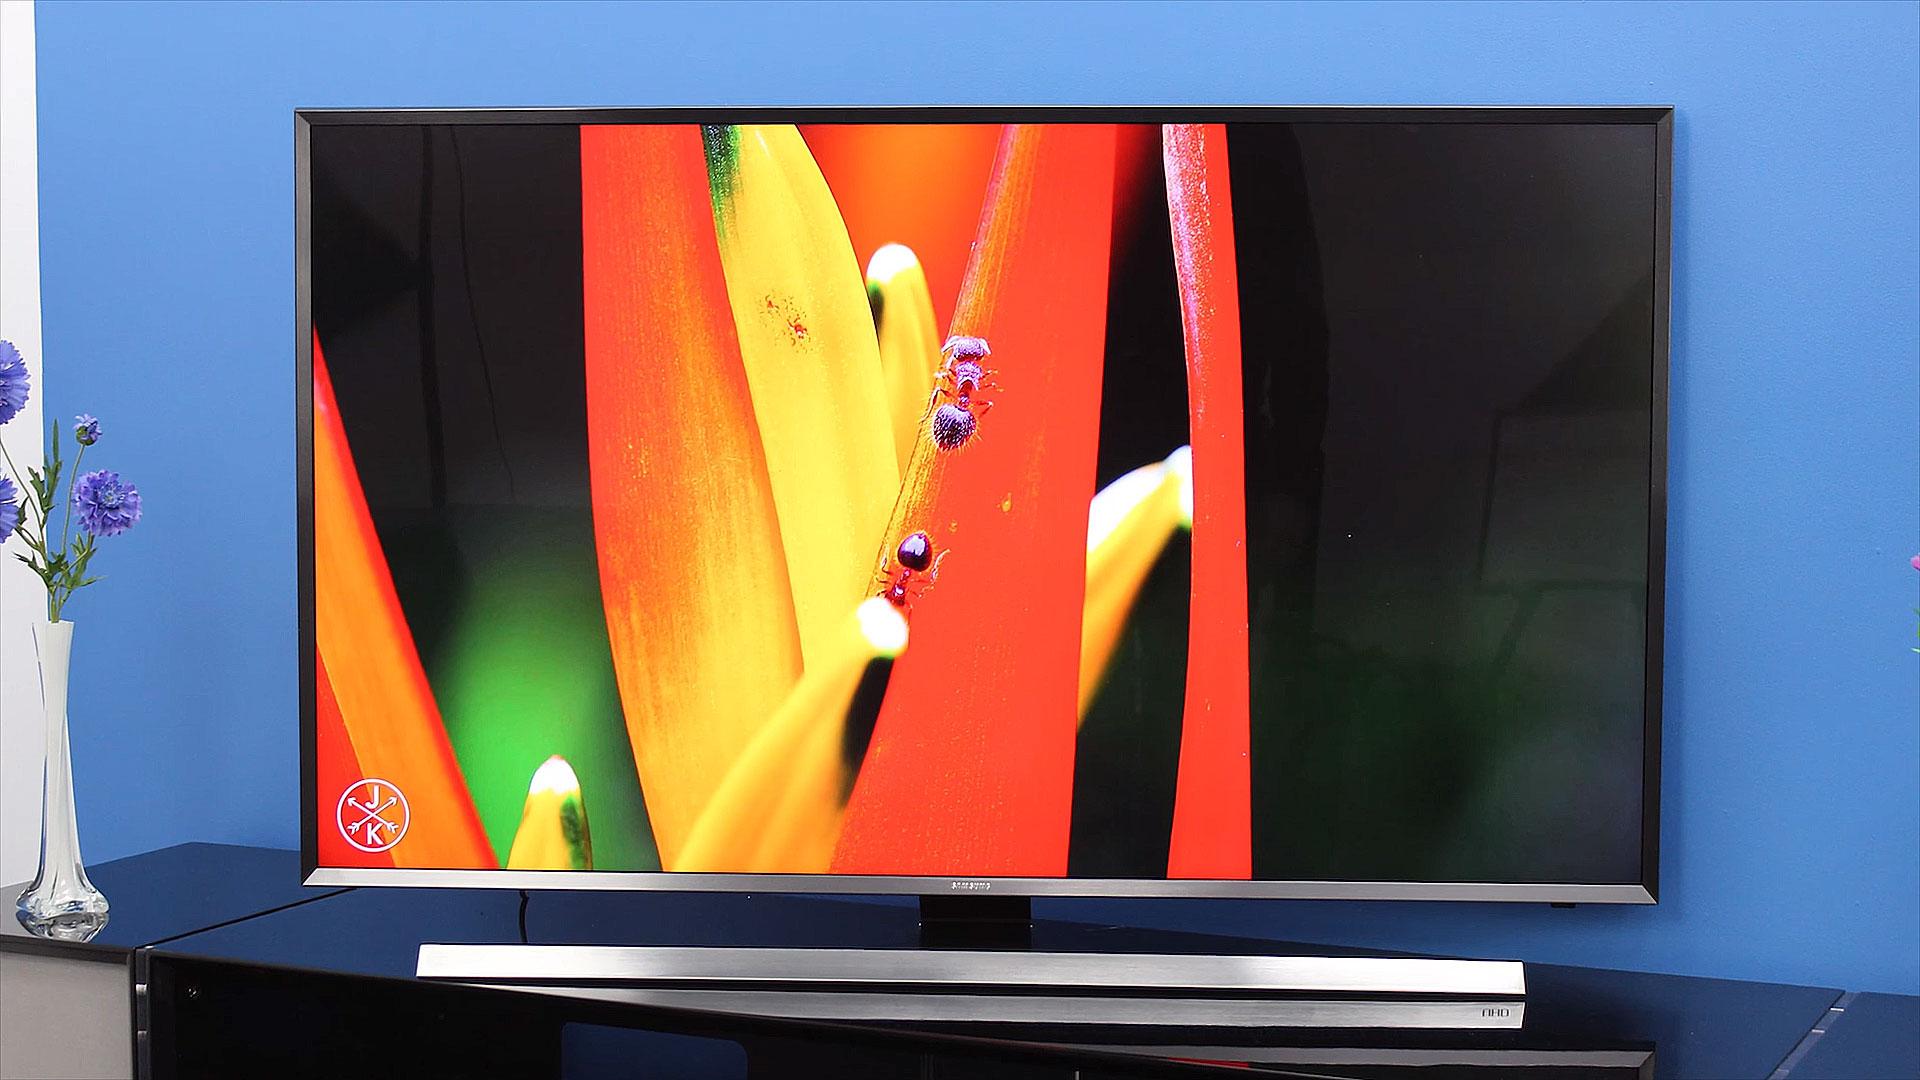 сейчас лучшая картинка на экран телевизора картину, рубит